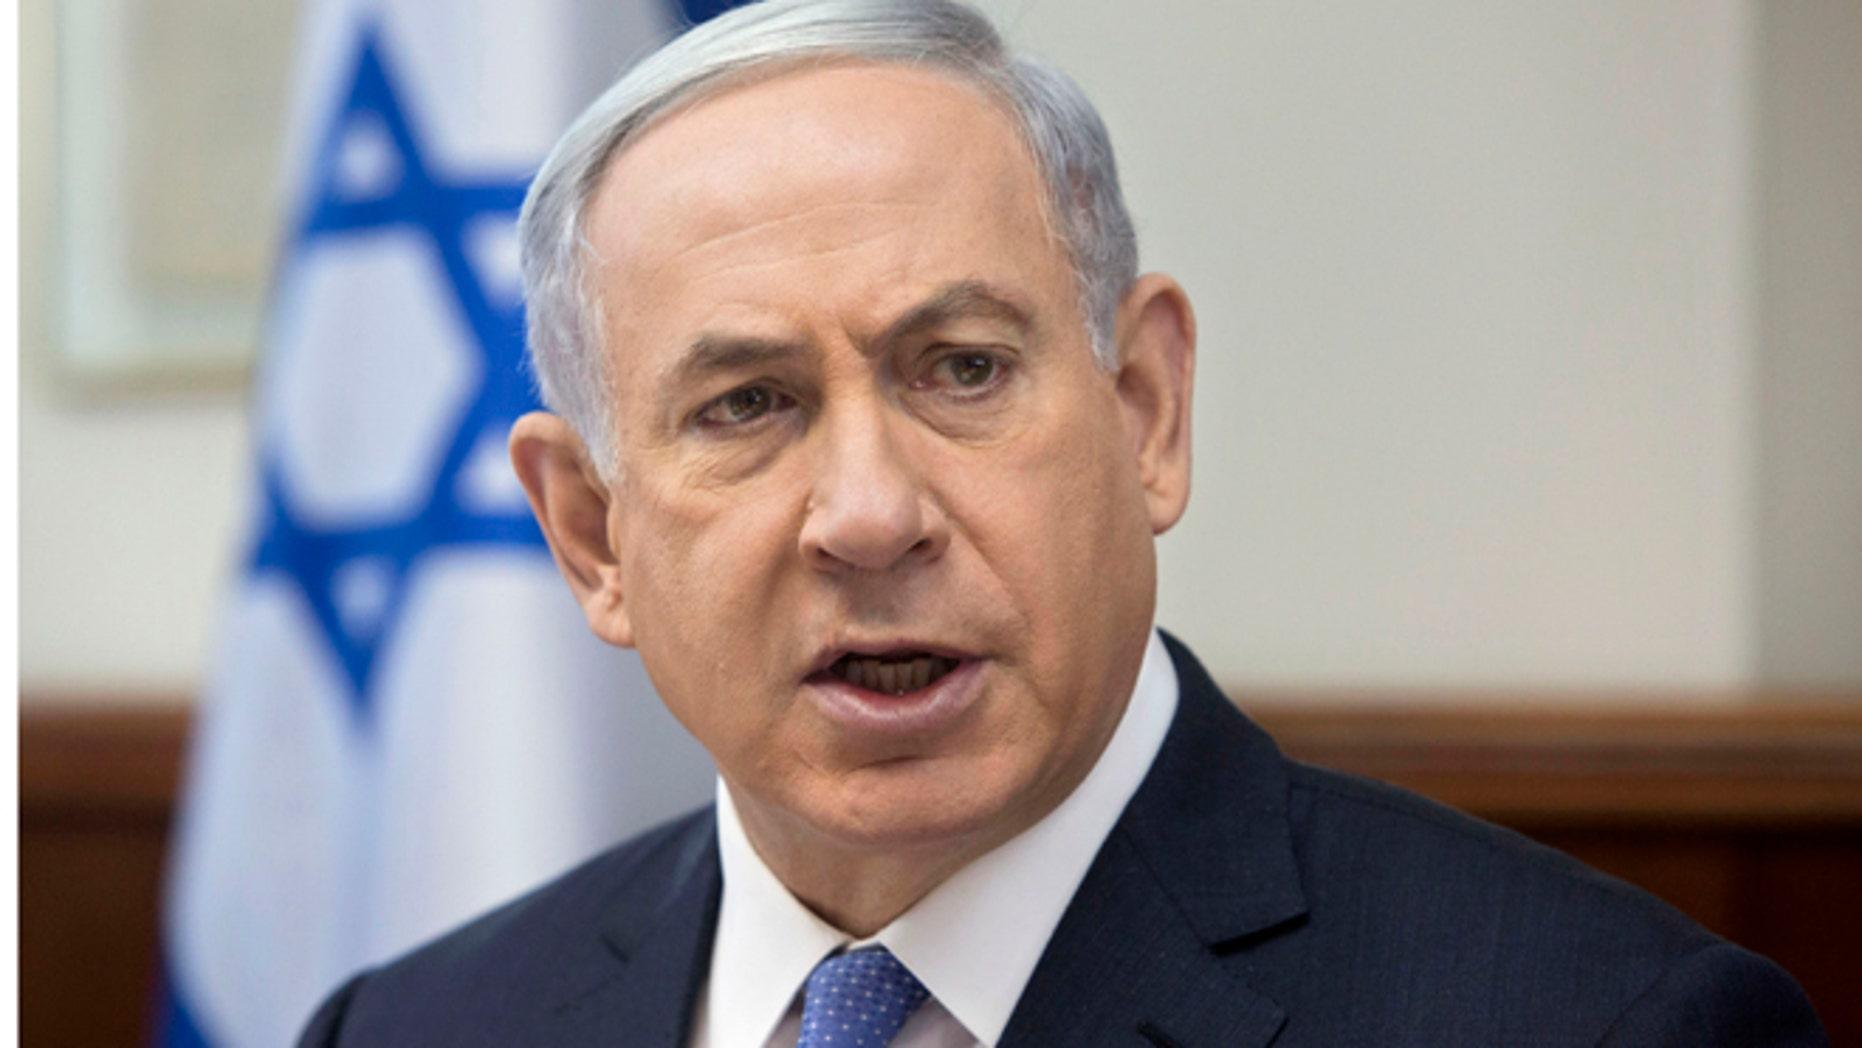 June 7, 2015: Israeli Prime Minister Benjamin Netanyahu attends the weekly cabinet meeting in his Jerusalem office.